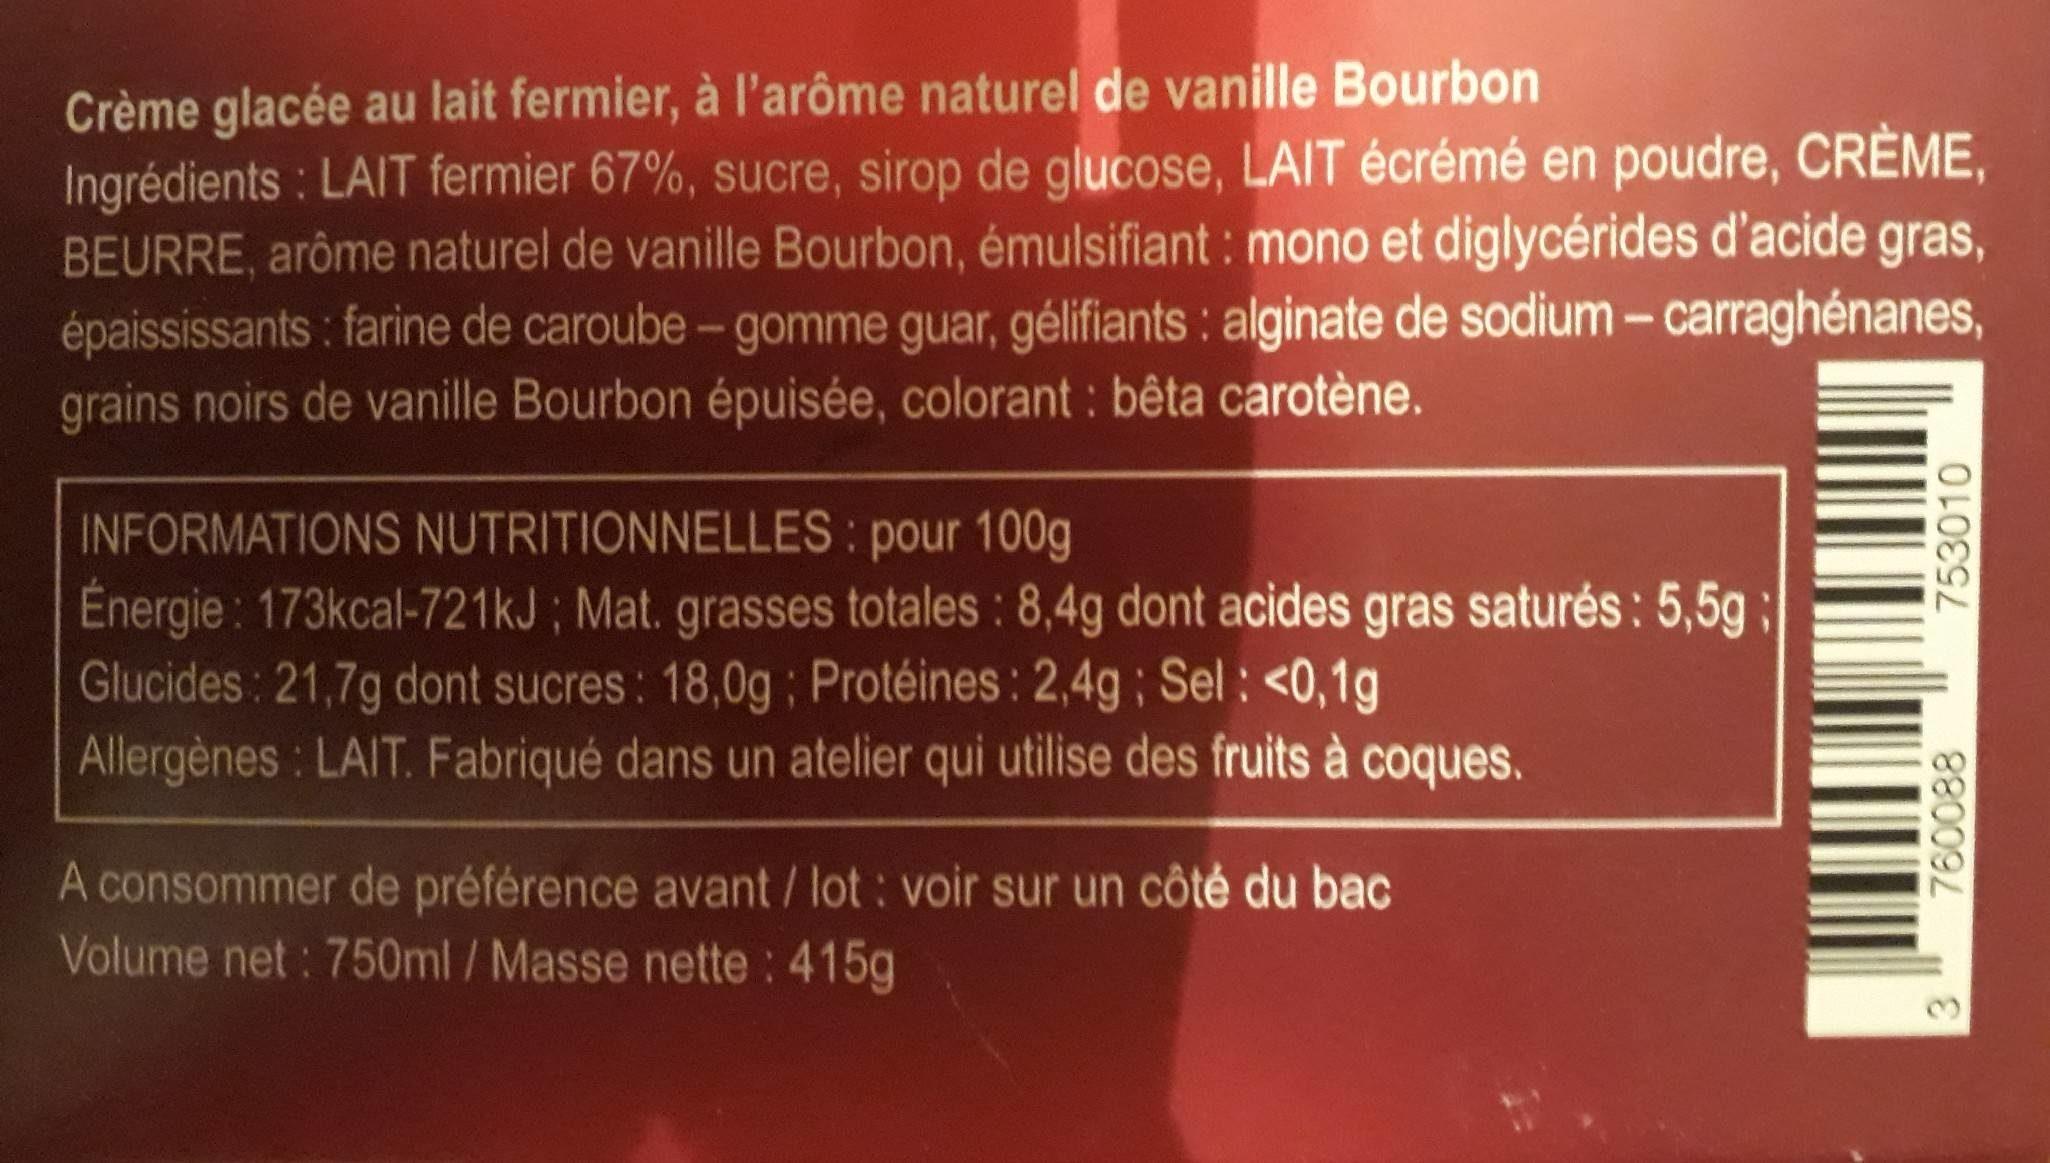 Creme glacee a la vanille TERRES BLEUES - Informations nutritionnelles